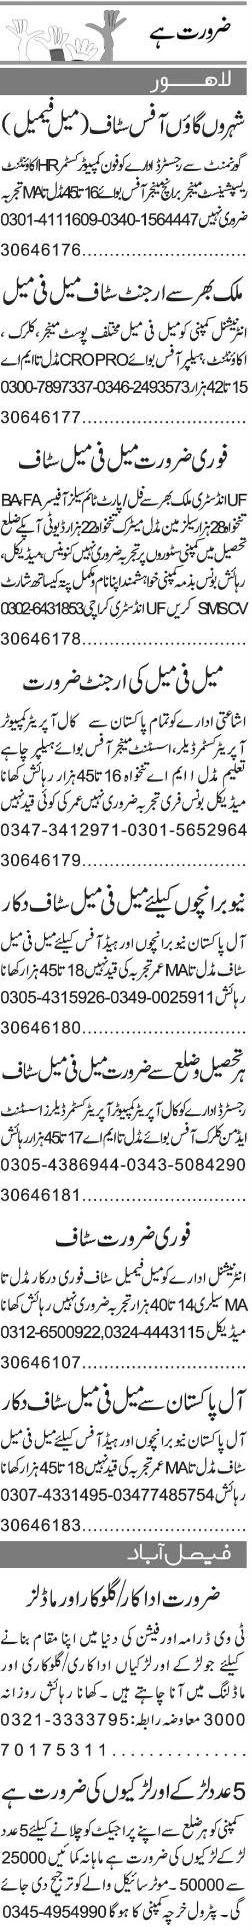 Telephone Operators, HR Accountant Job Opportunity